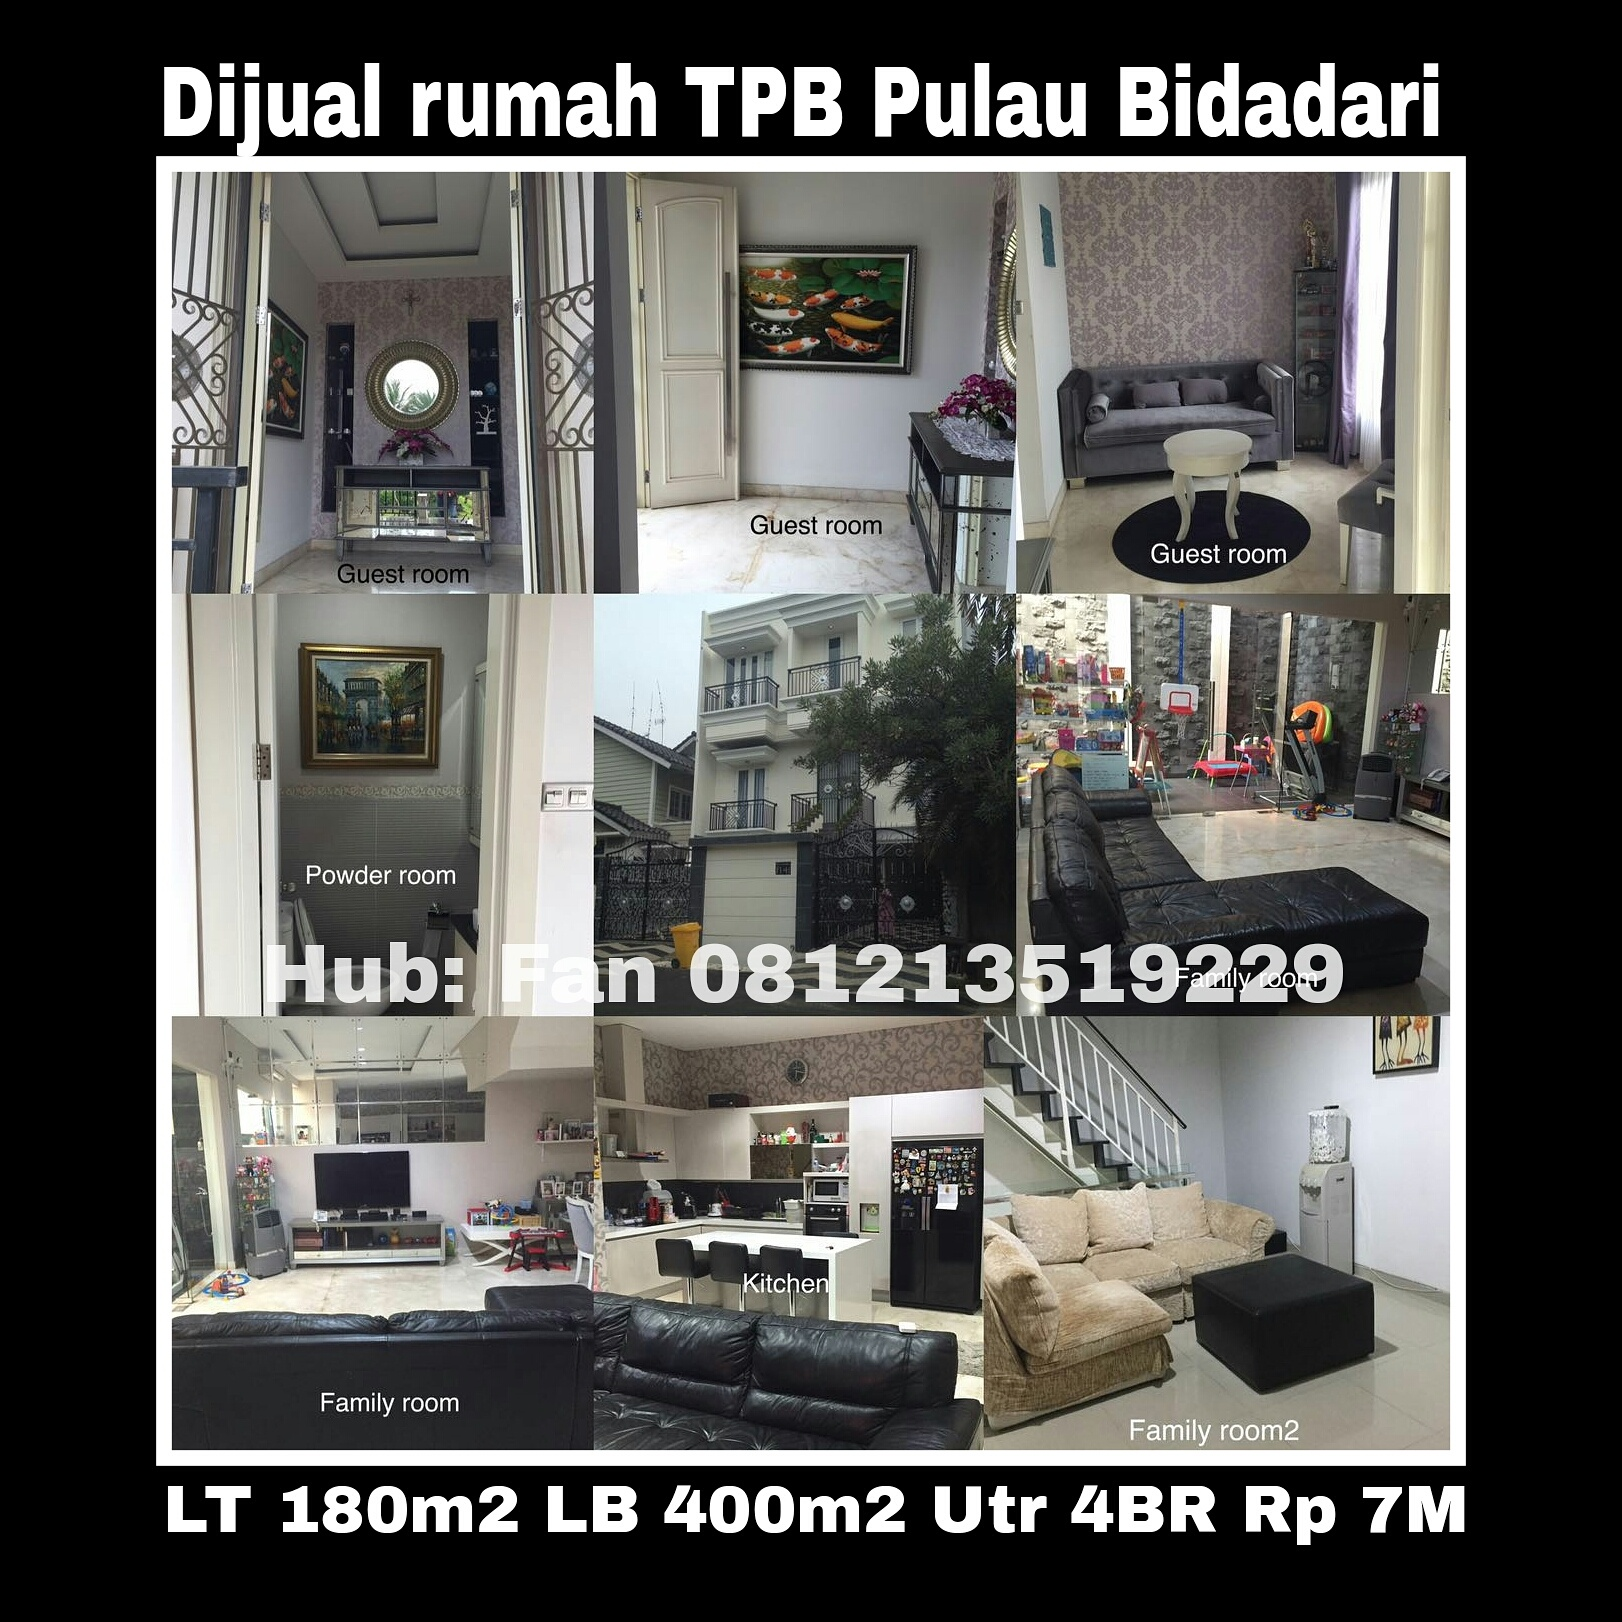 Rumah Pulau Bidadari TPB 3,5LT.jpg